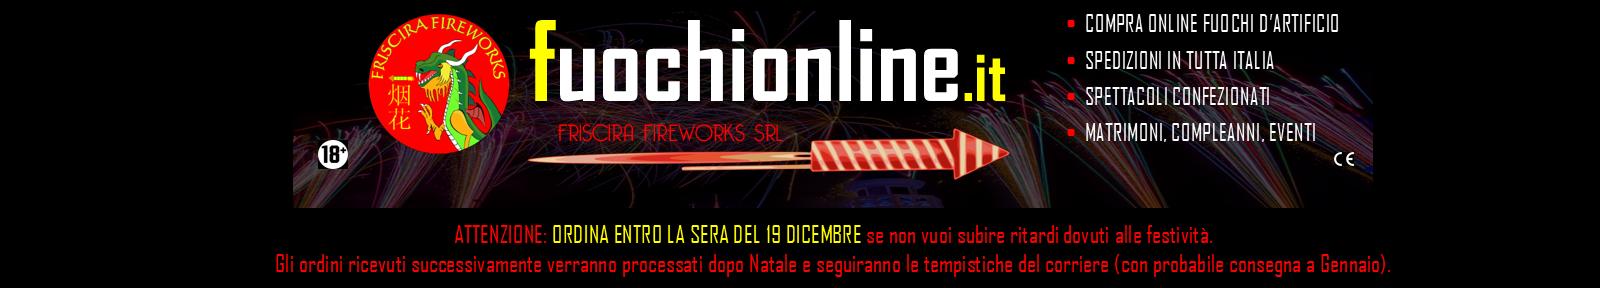 Vendita Fuochi d'Artificio Online